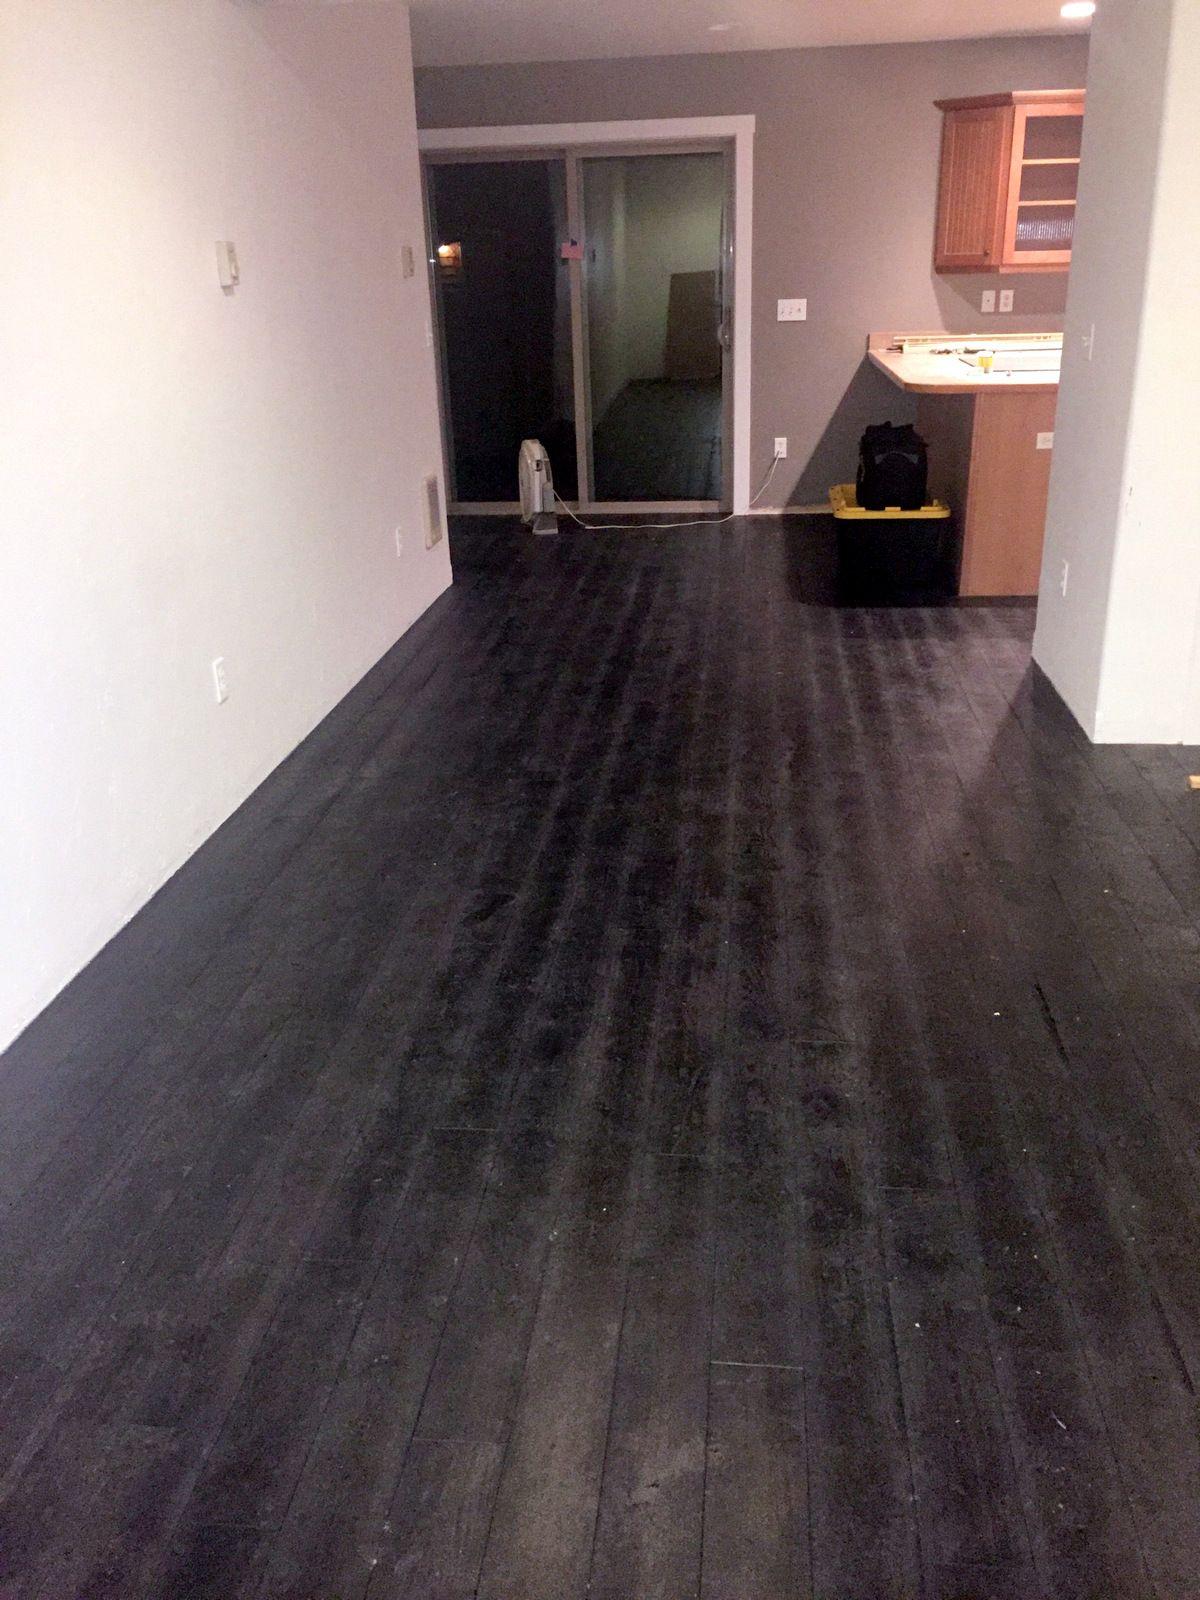 Similar To Shou Sugi Ban Burnt Wood Flooring Our Charcoal Color Is The Darkest Floor We Offer Shown Here Rustic Wood Floors Reclaimed Wood Floors Flooring